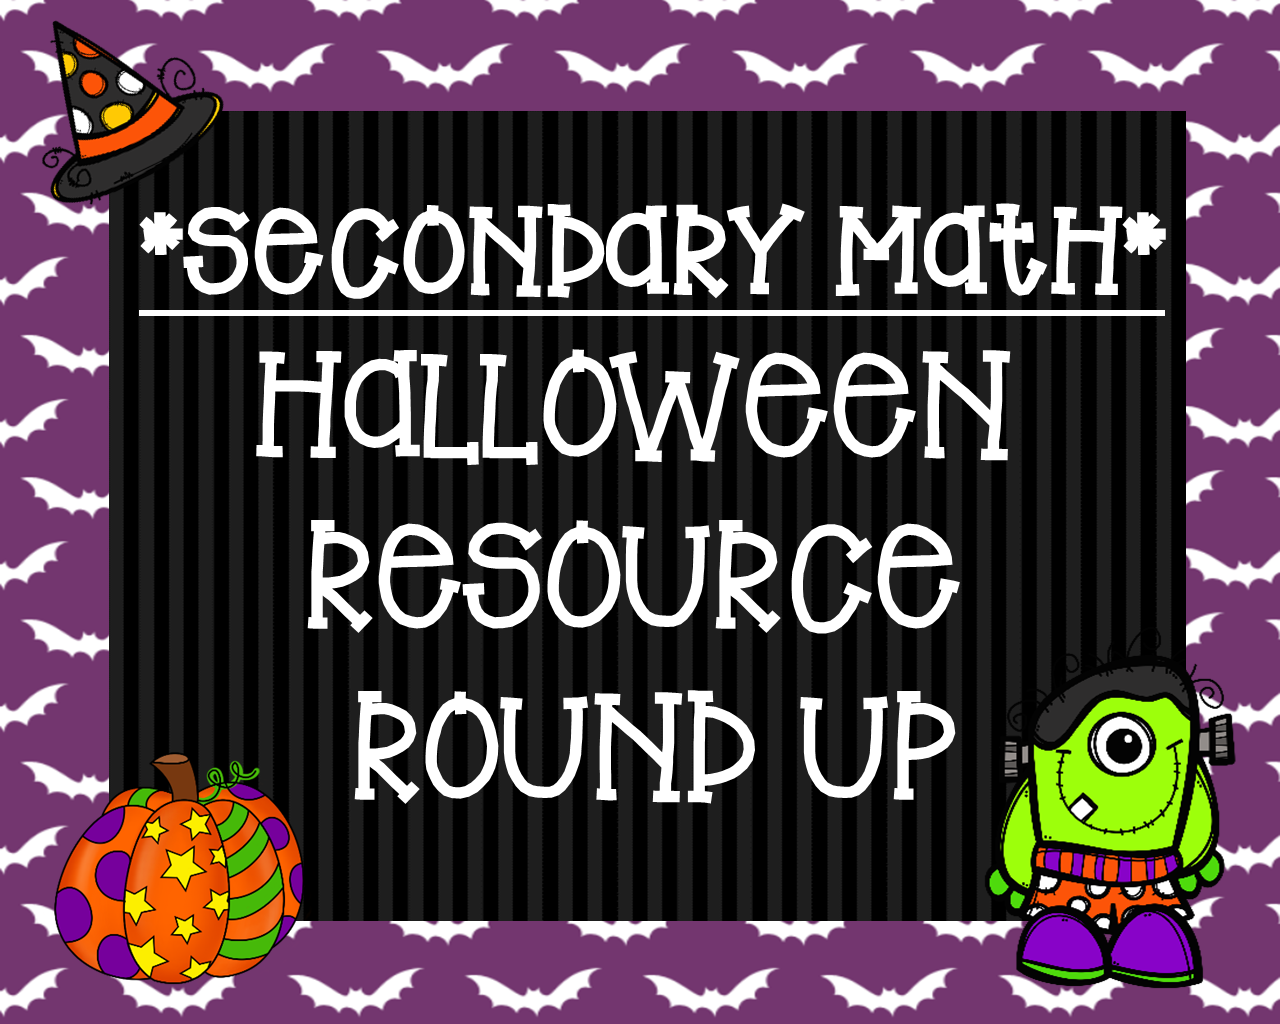 4 The Love Of Math Secondary Math Halloween Resource